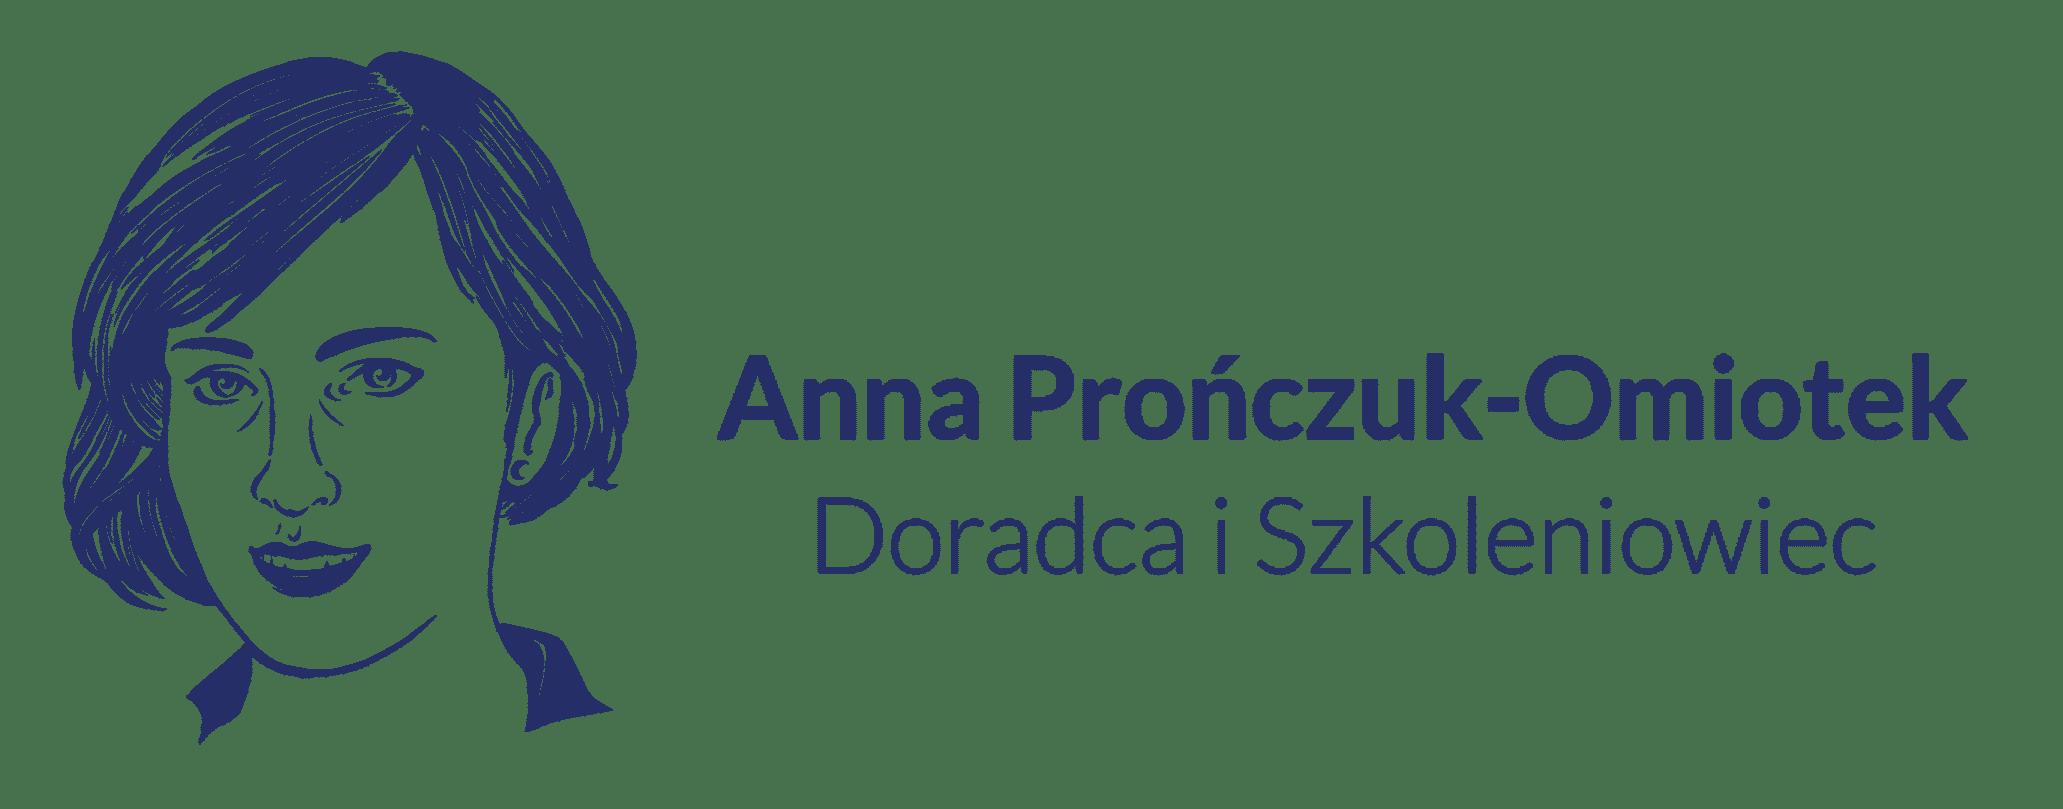 Anna Prończuk-Omiotek